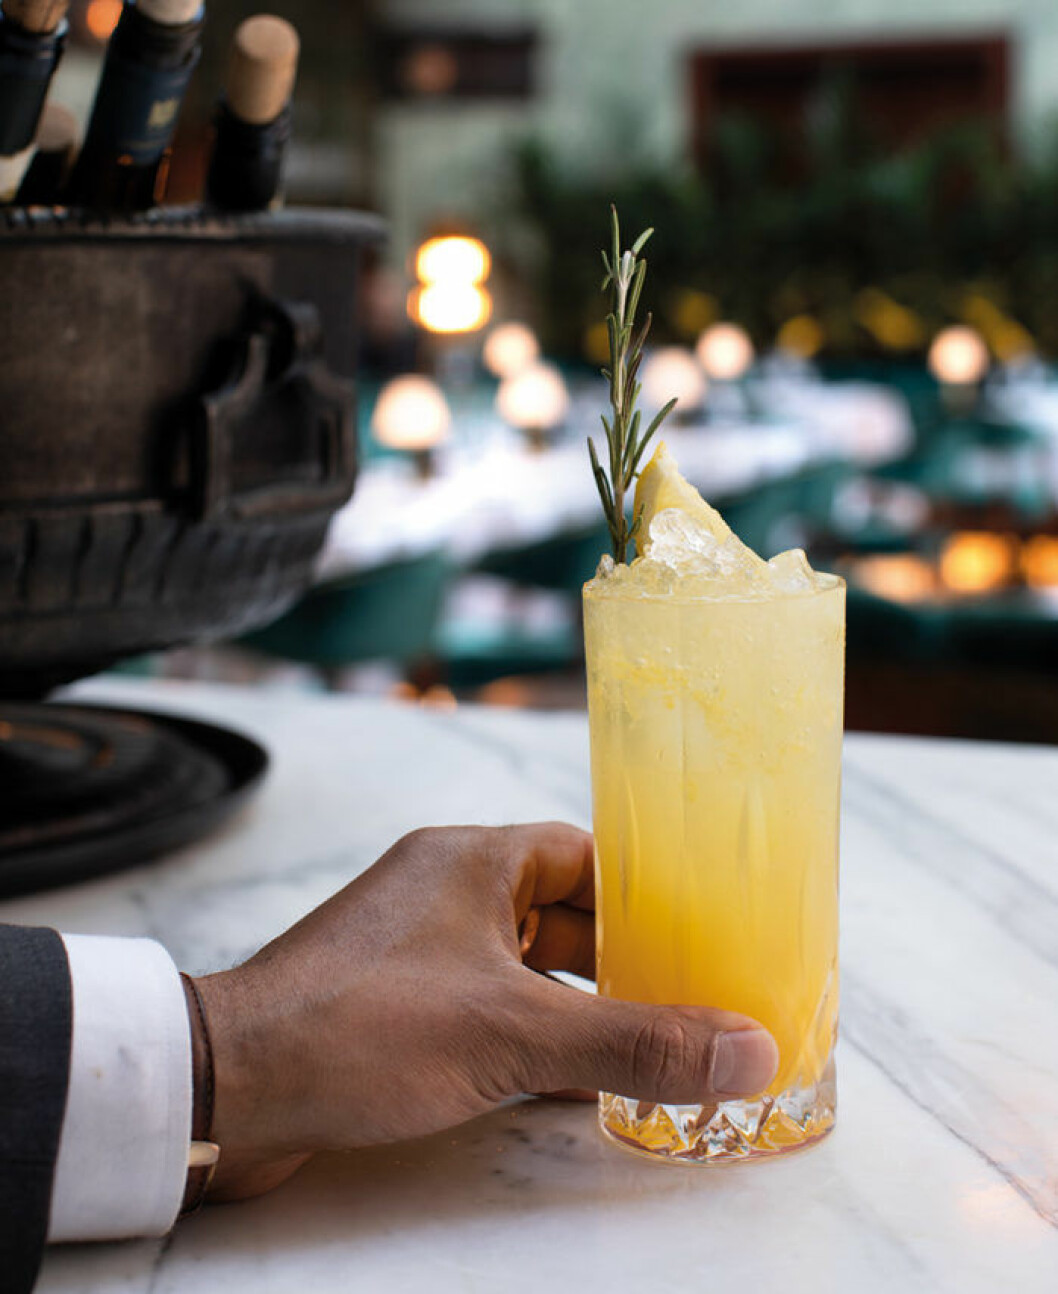 Den alkoholfria drinken Mediterranean Sour från Bank Hotel.